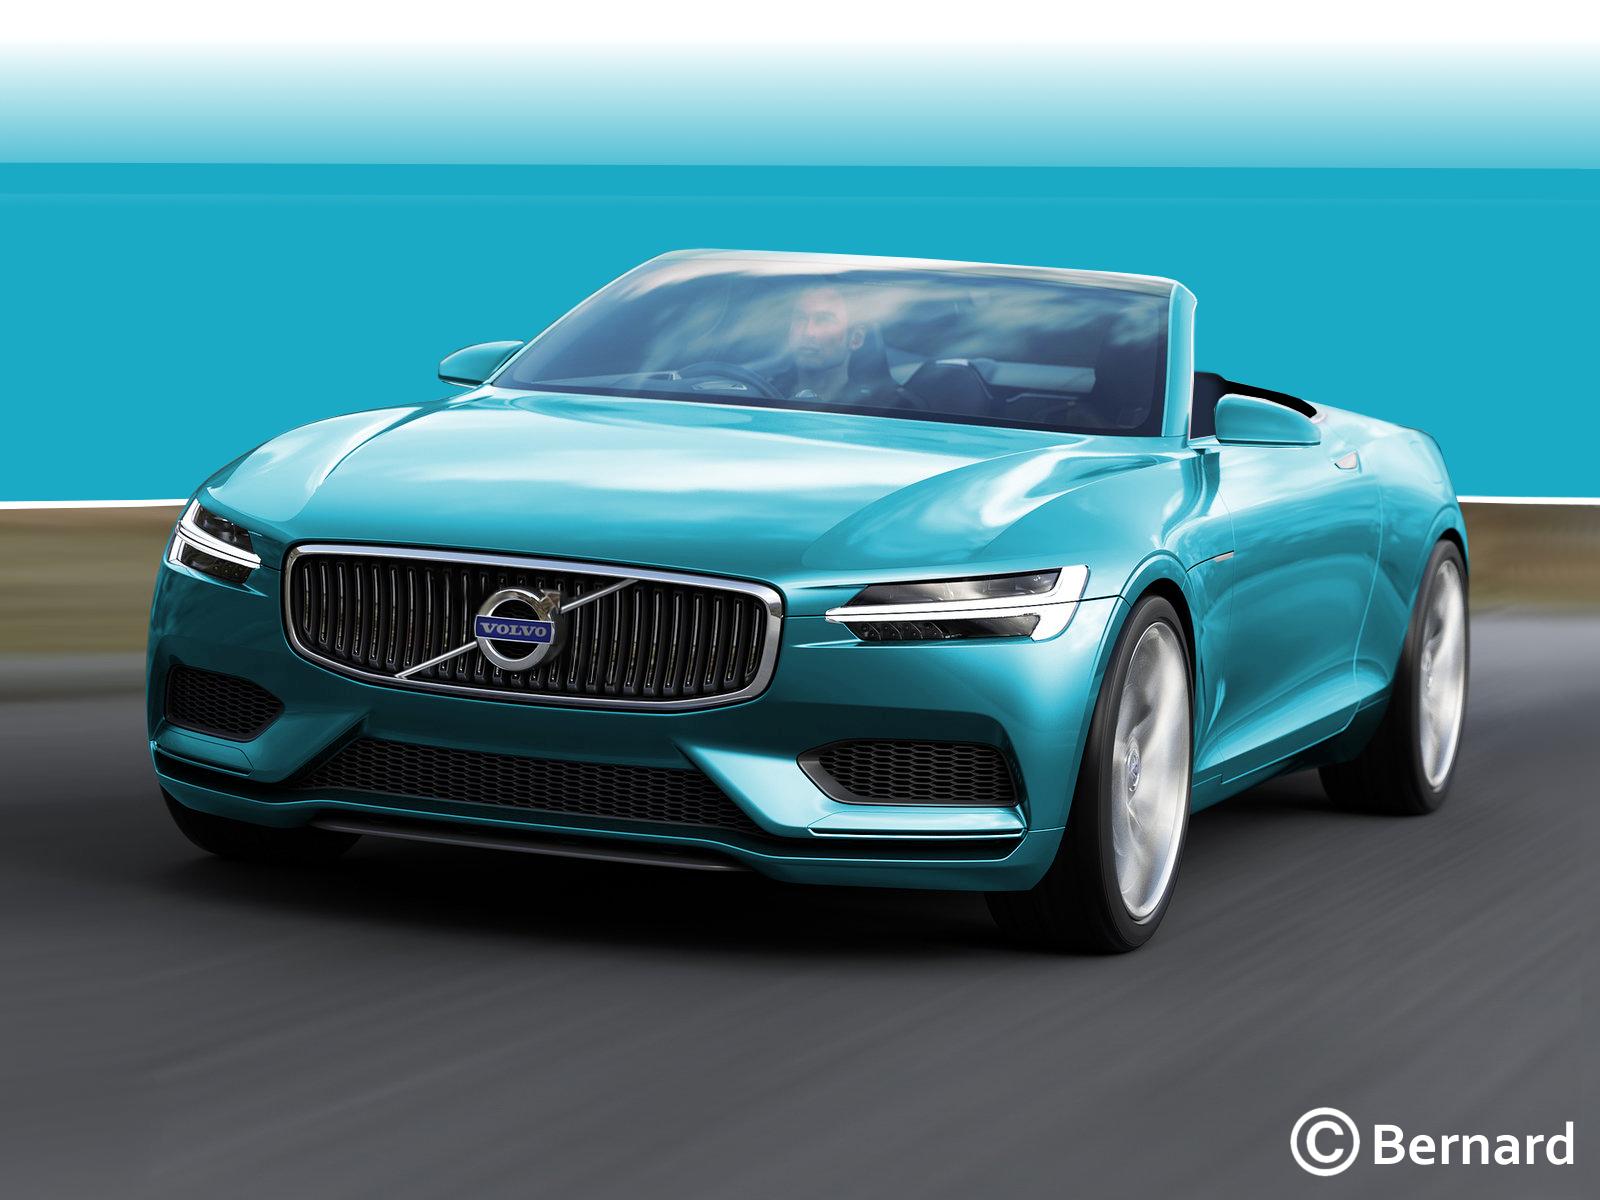 Bernard Car Design October 2016